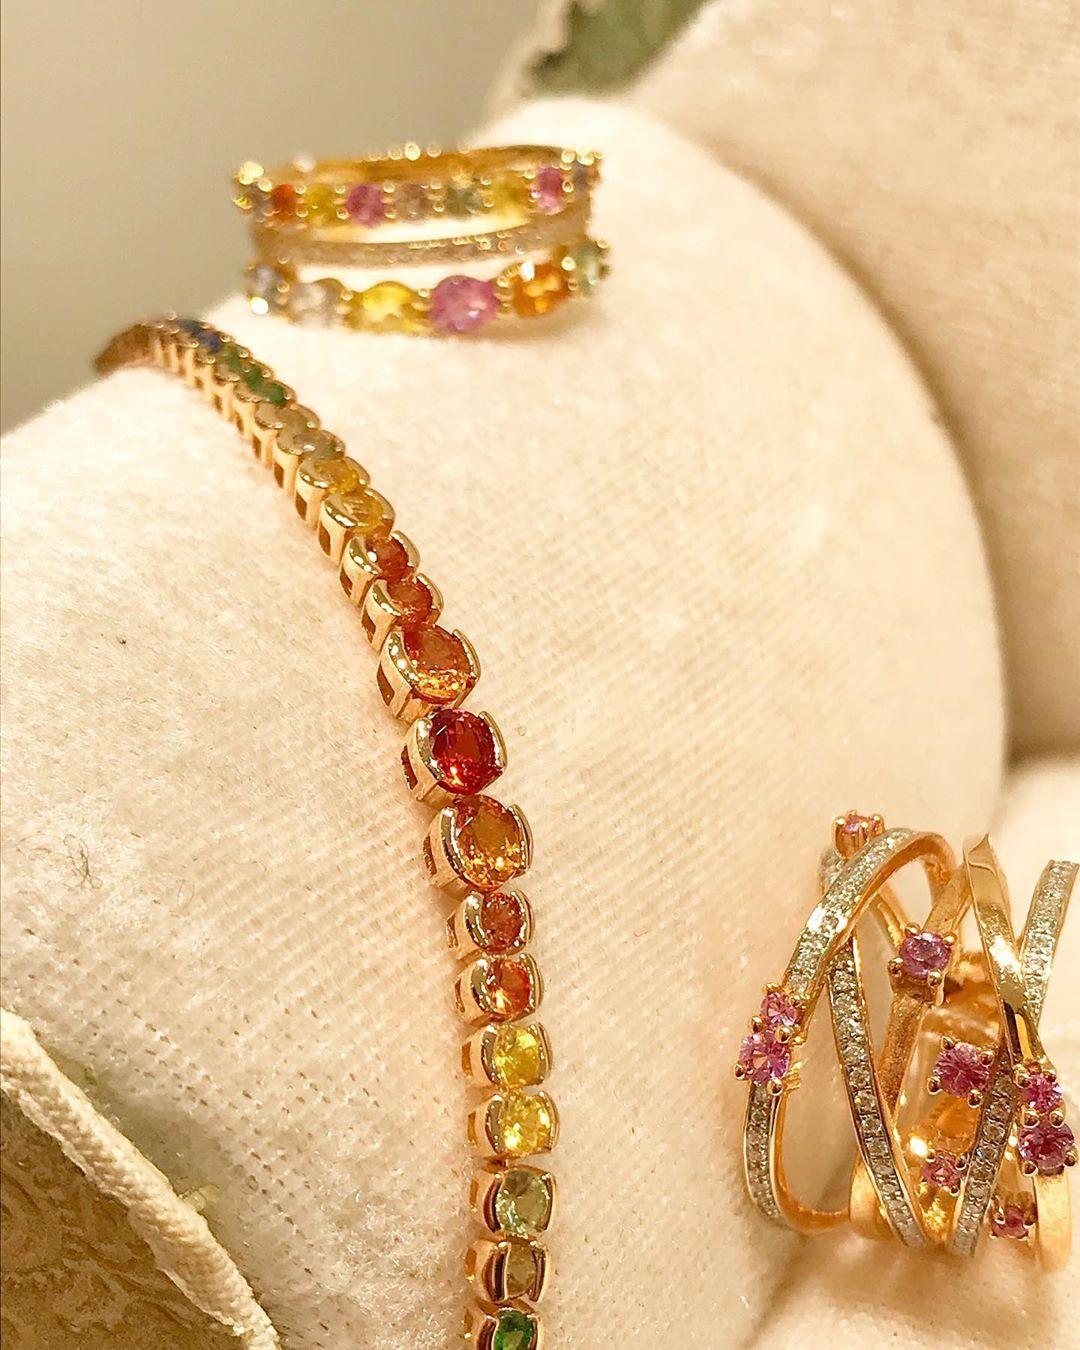 Tumblr In 2020 Charm Bracelet Jewelry Bracelets